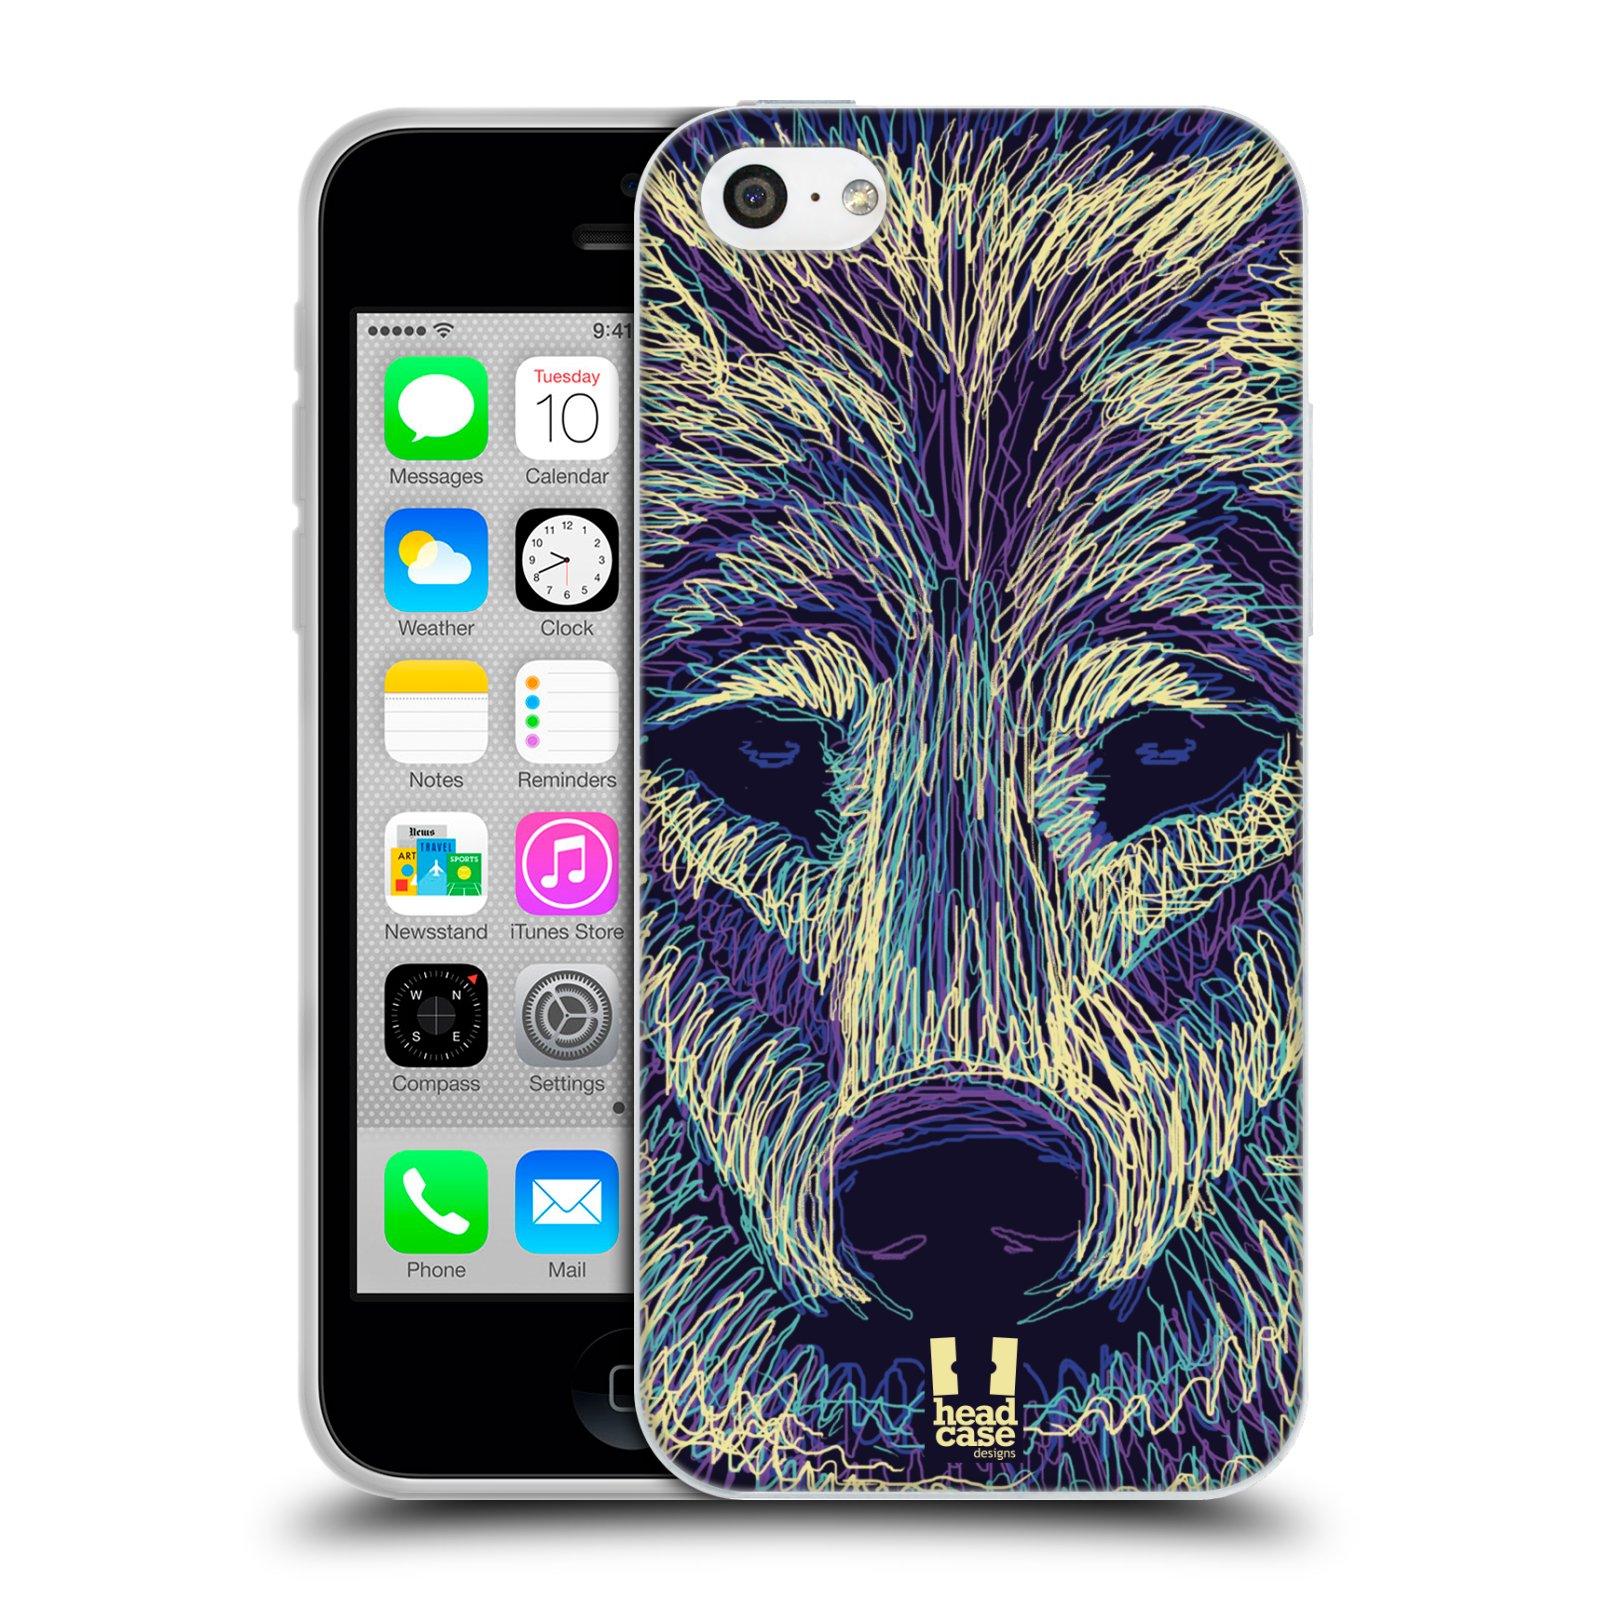 HEAD CASE silikonový obal na mobil Apple Iphone 5C vzor zvíře čmáranice vlk